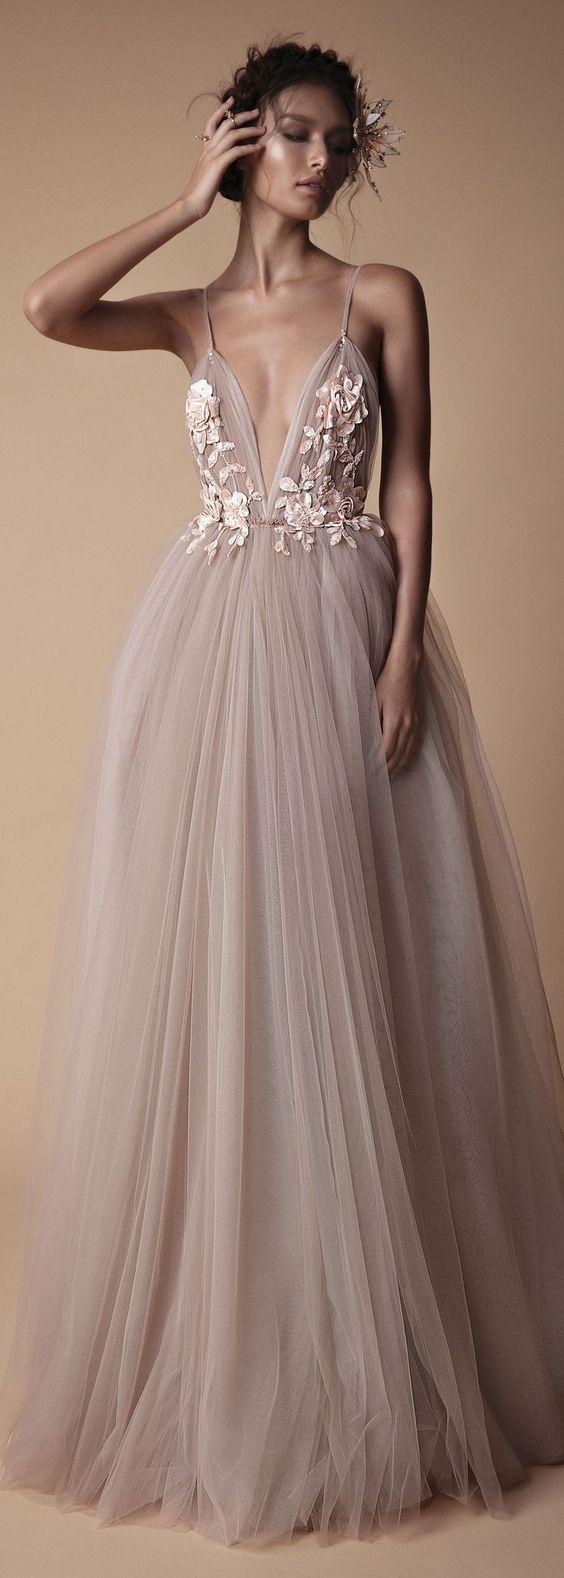 new v collar wedding dress silk net wedding dress from prom